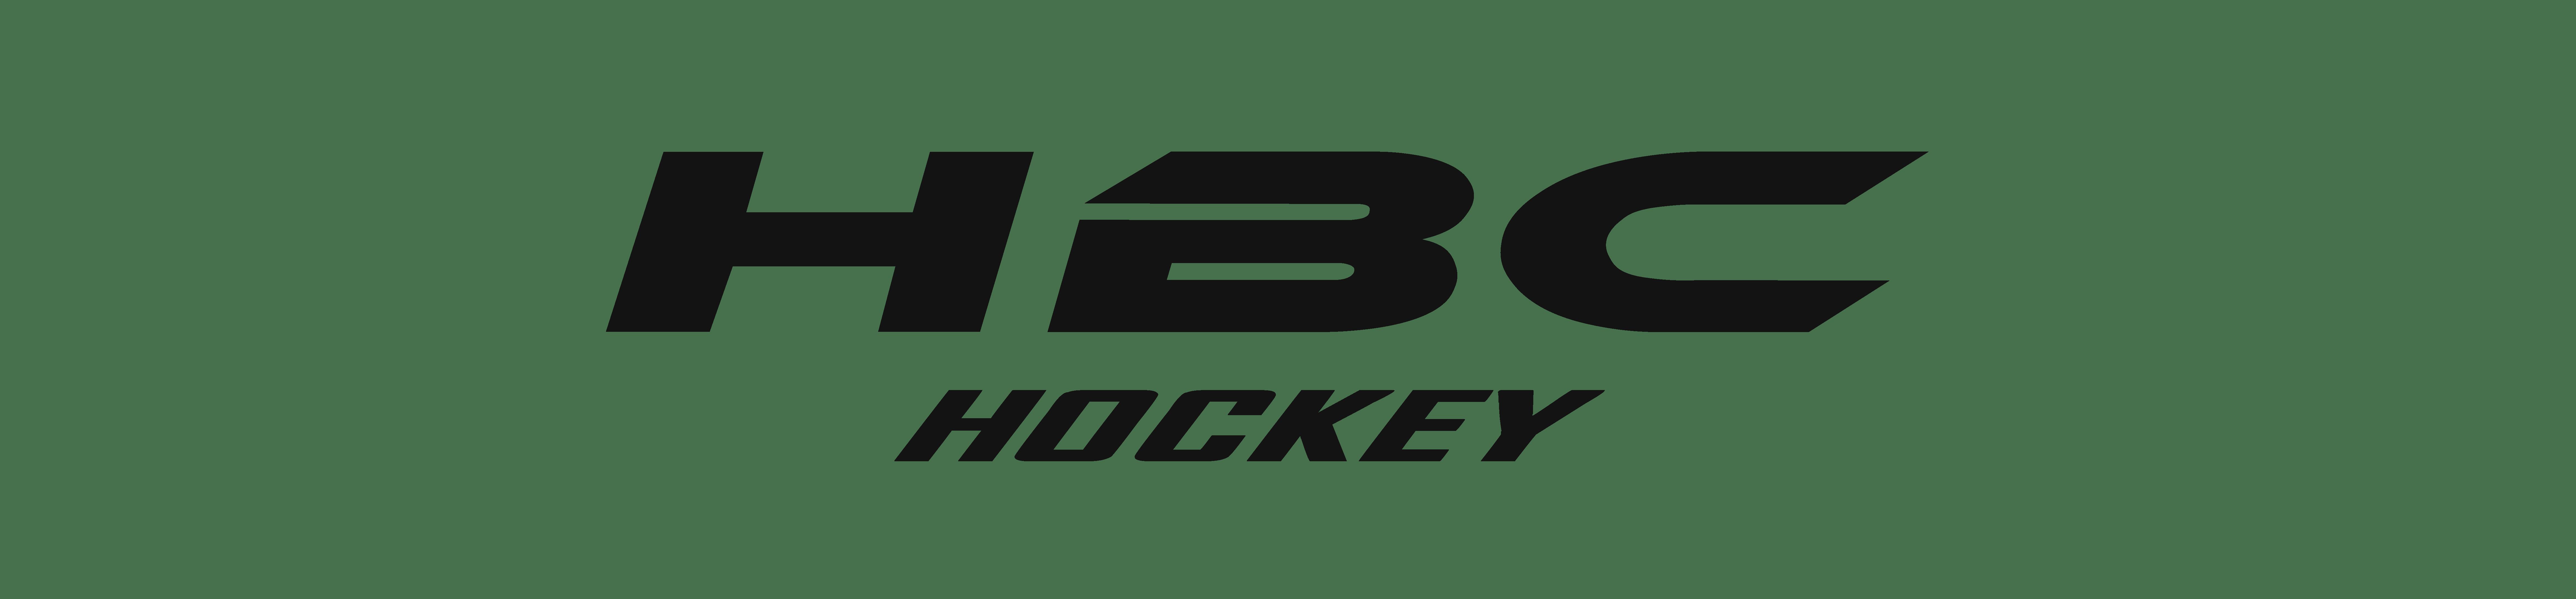 HBC Hockey